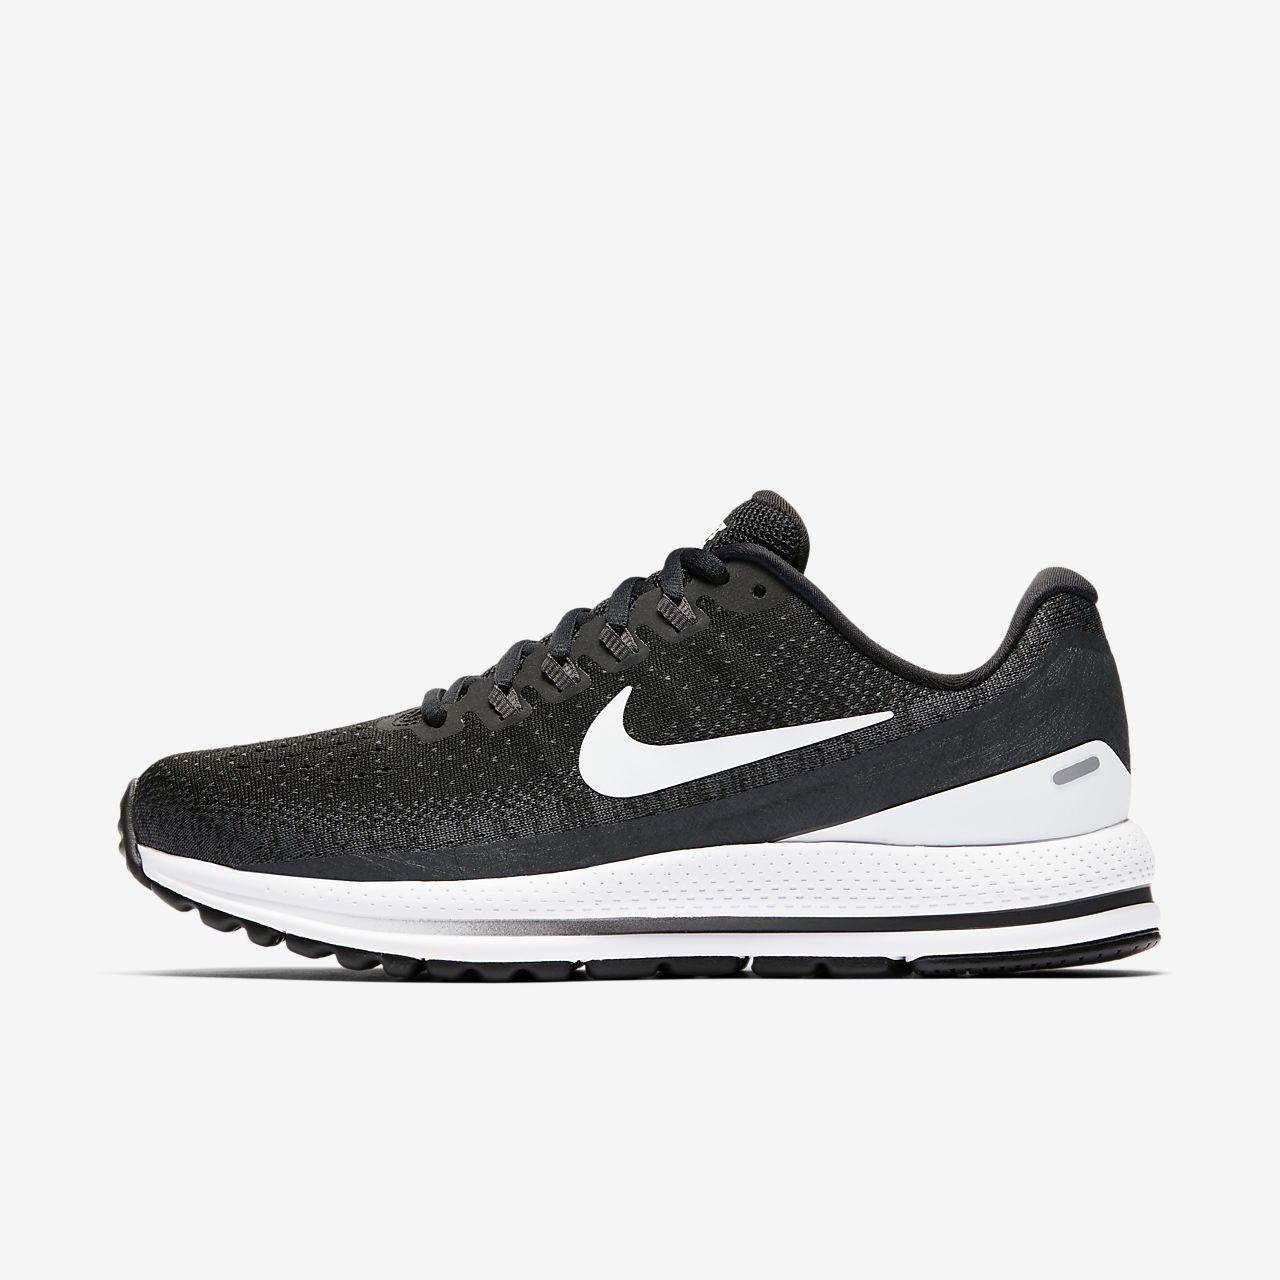 Chaussure de running Nike Air Zoom Vomero 13 pour Femme